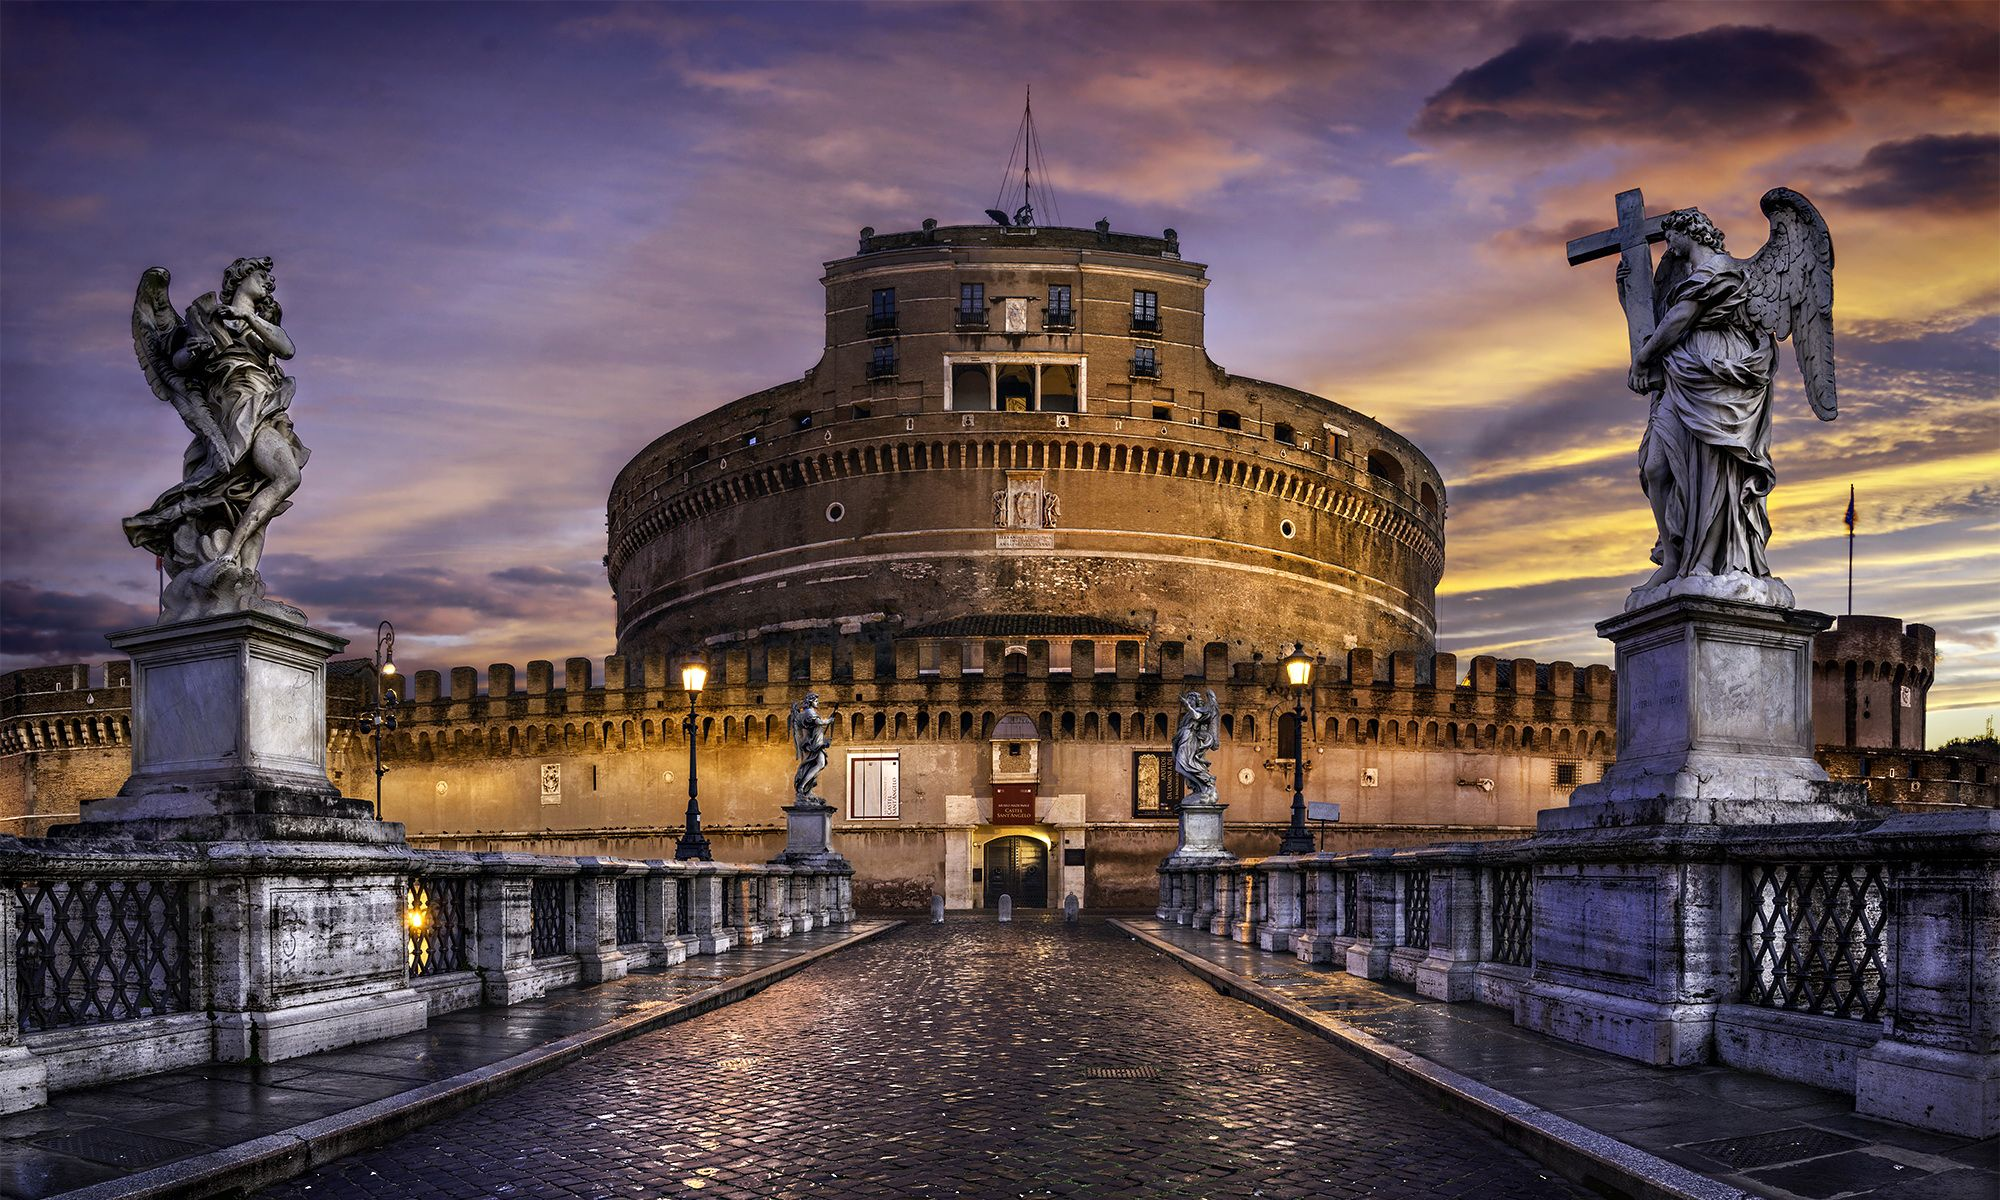 Castel-SantAngelo-Rome-Italy